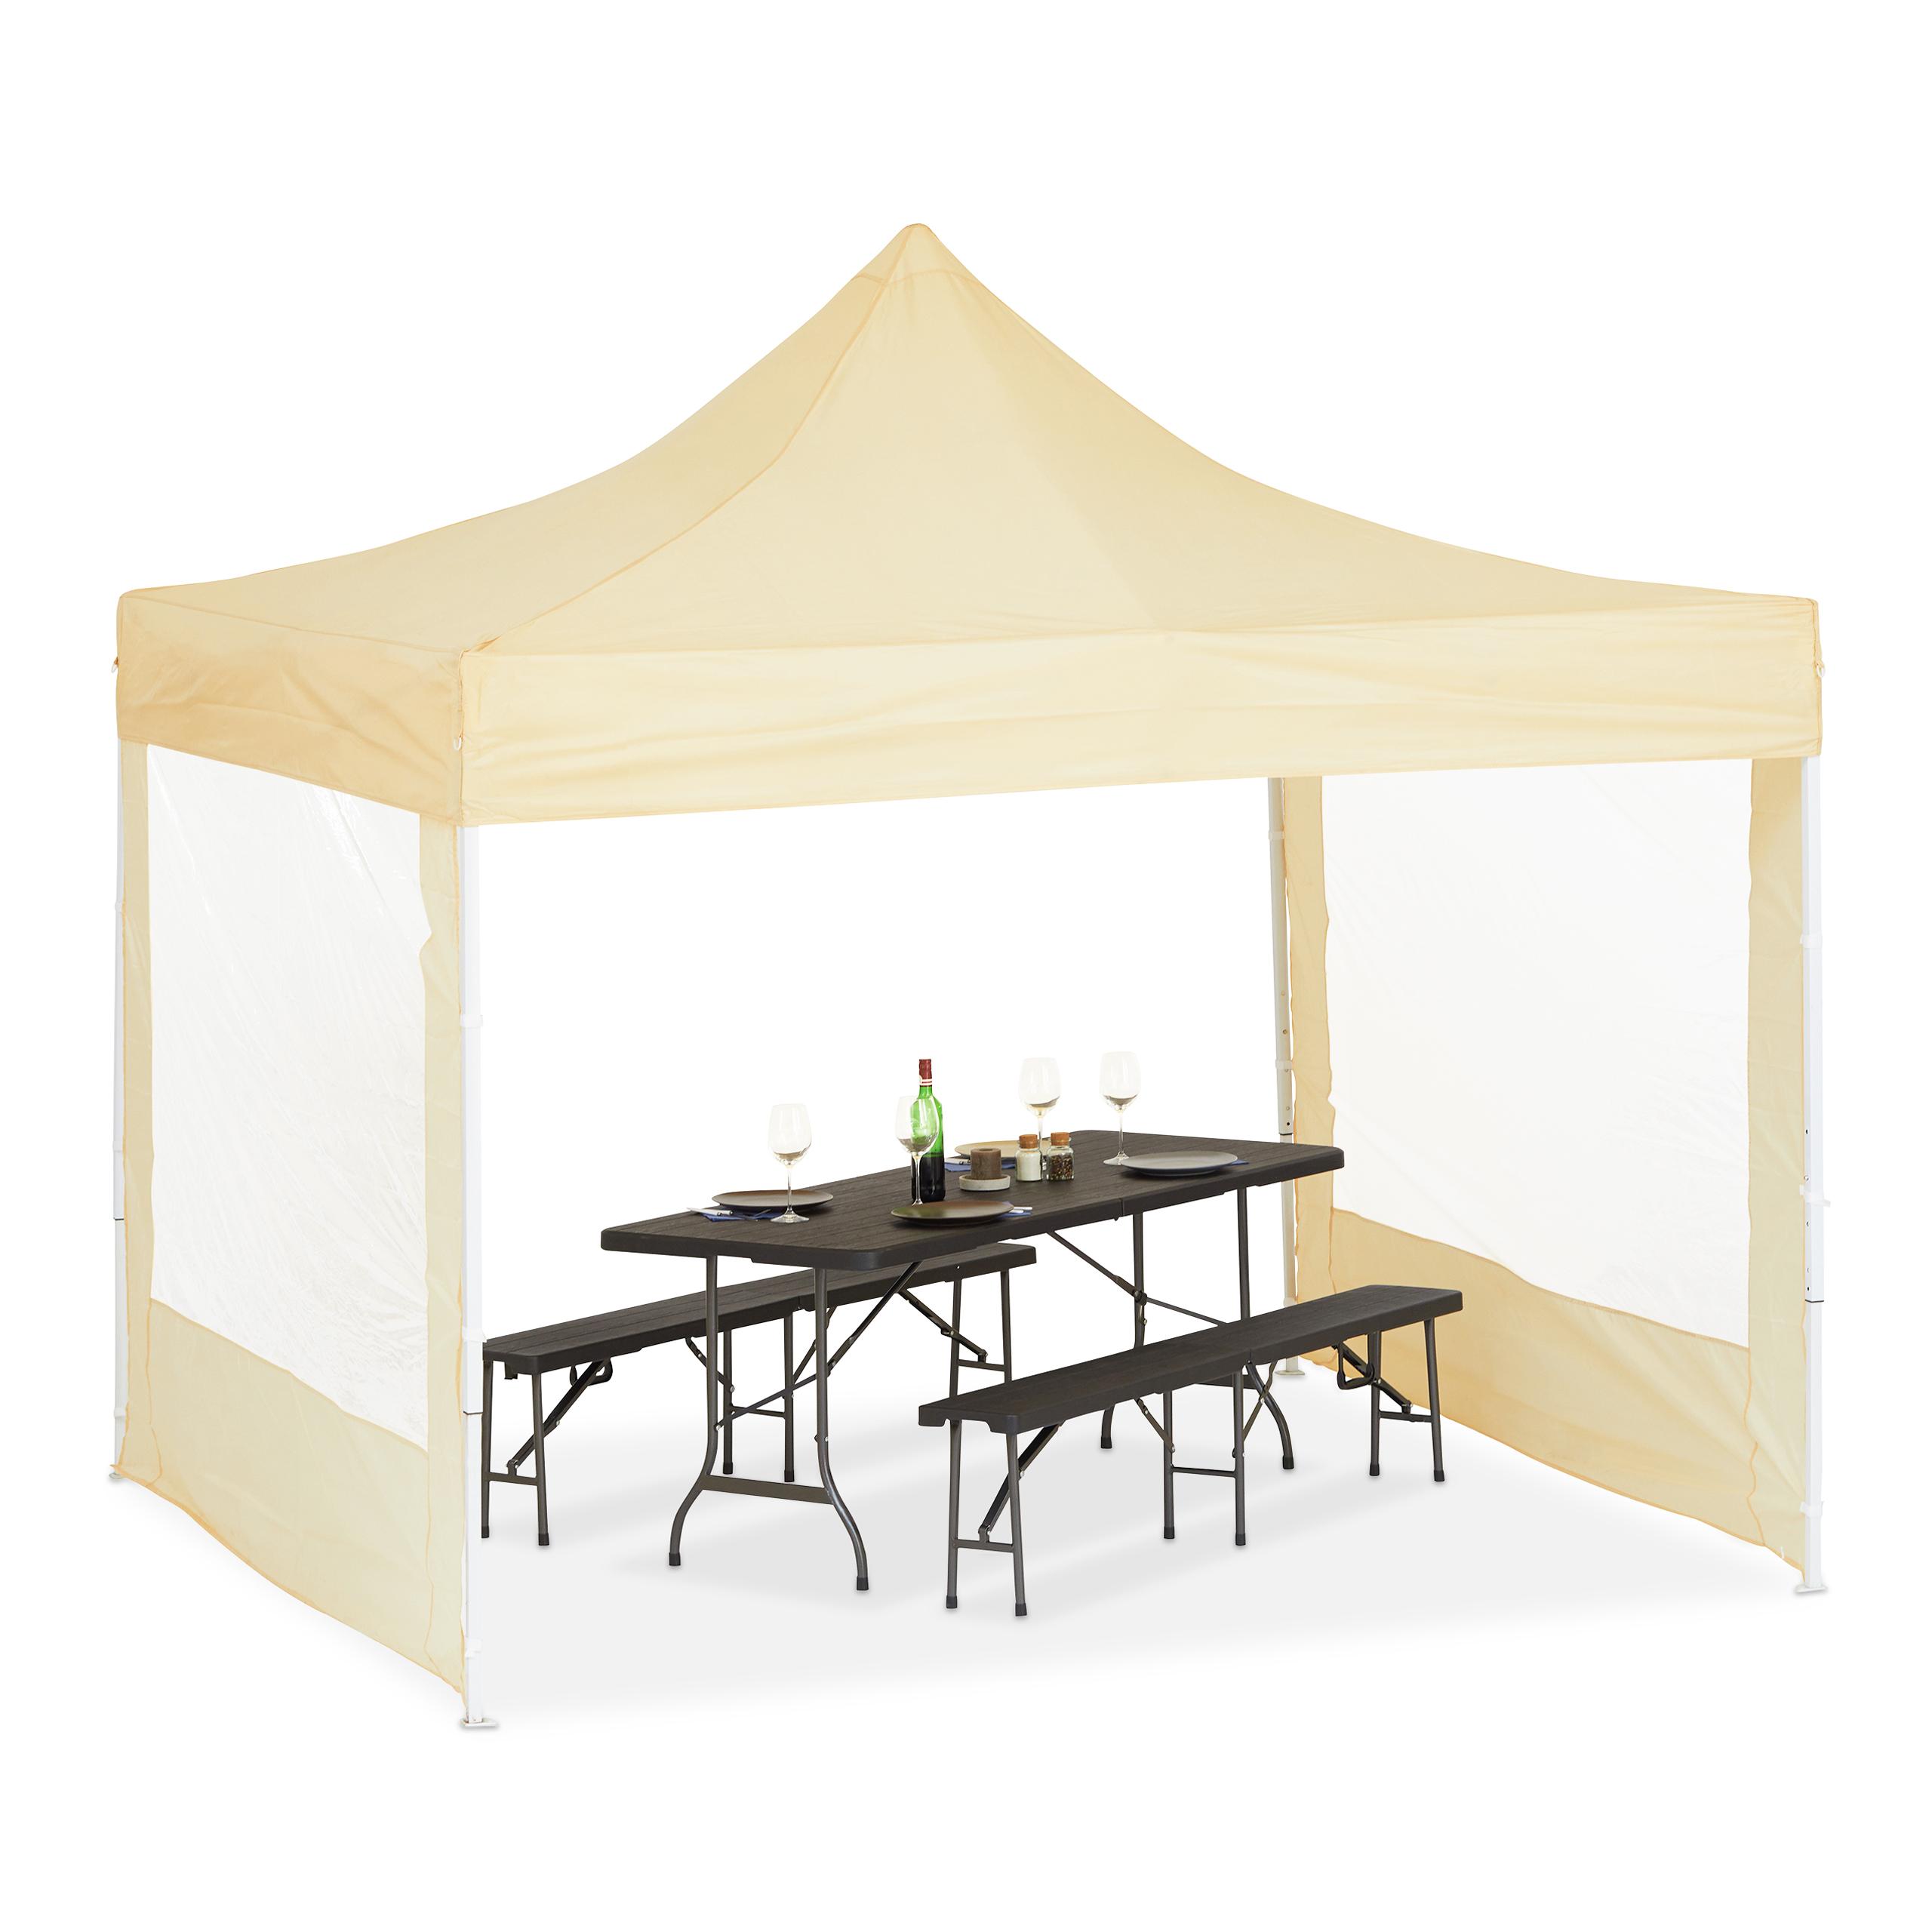 faltpavillon 3x3 m 2 seitenteile festzelt partyzelt pvc champagnerfarben metall ebay. Black Bedroom Furniture Sets. Home Design Ideas